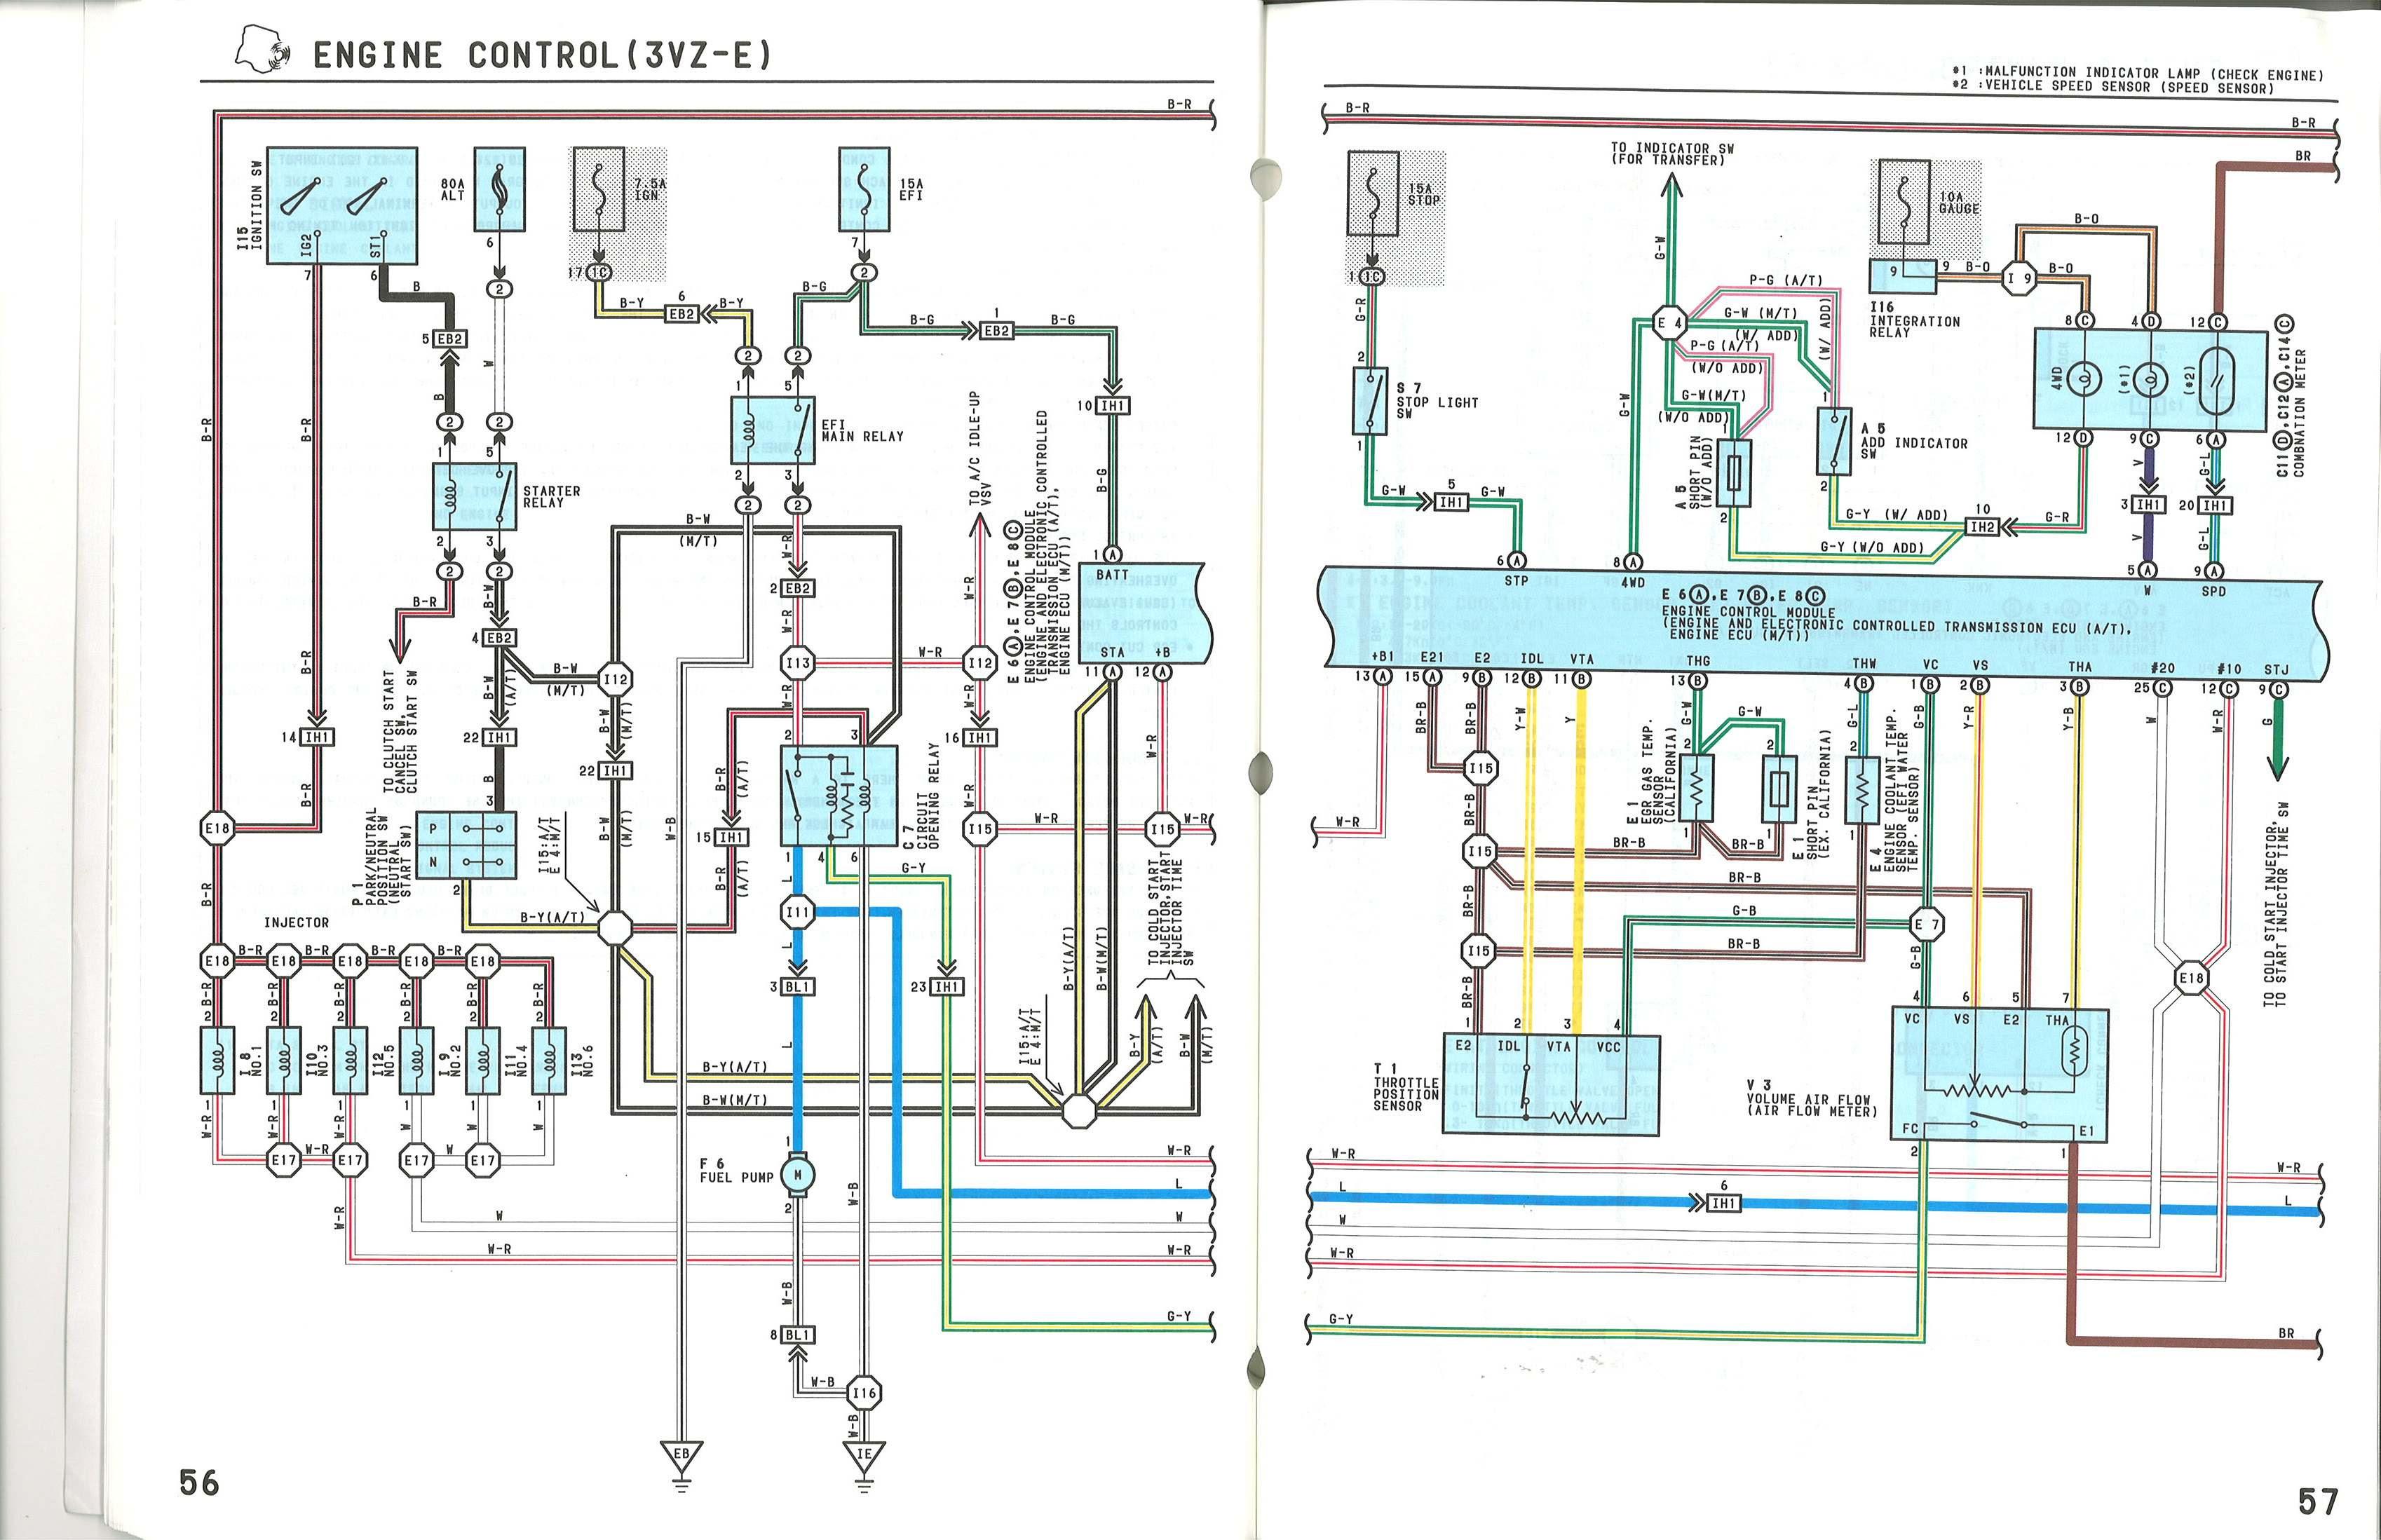 Toyota 1kz Te Ecu Wiring Diagram Http Eightstrings Blogspot Com